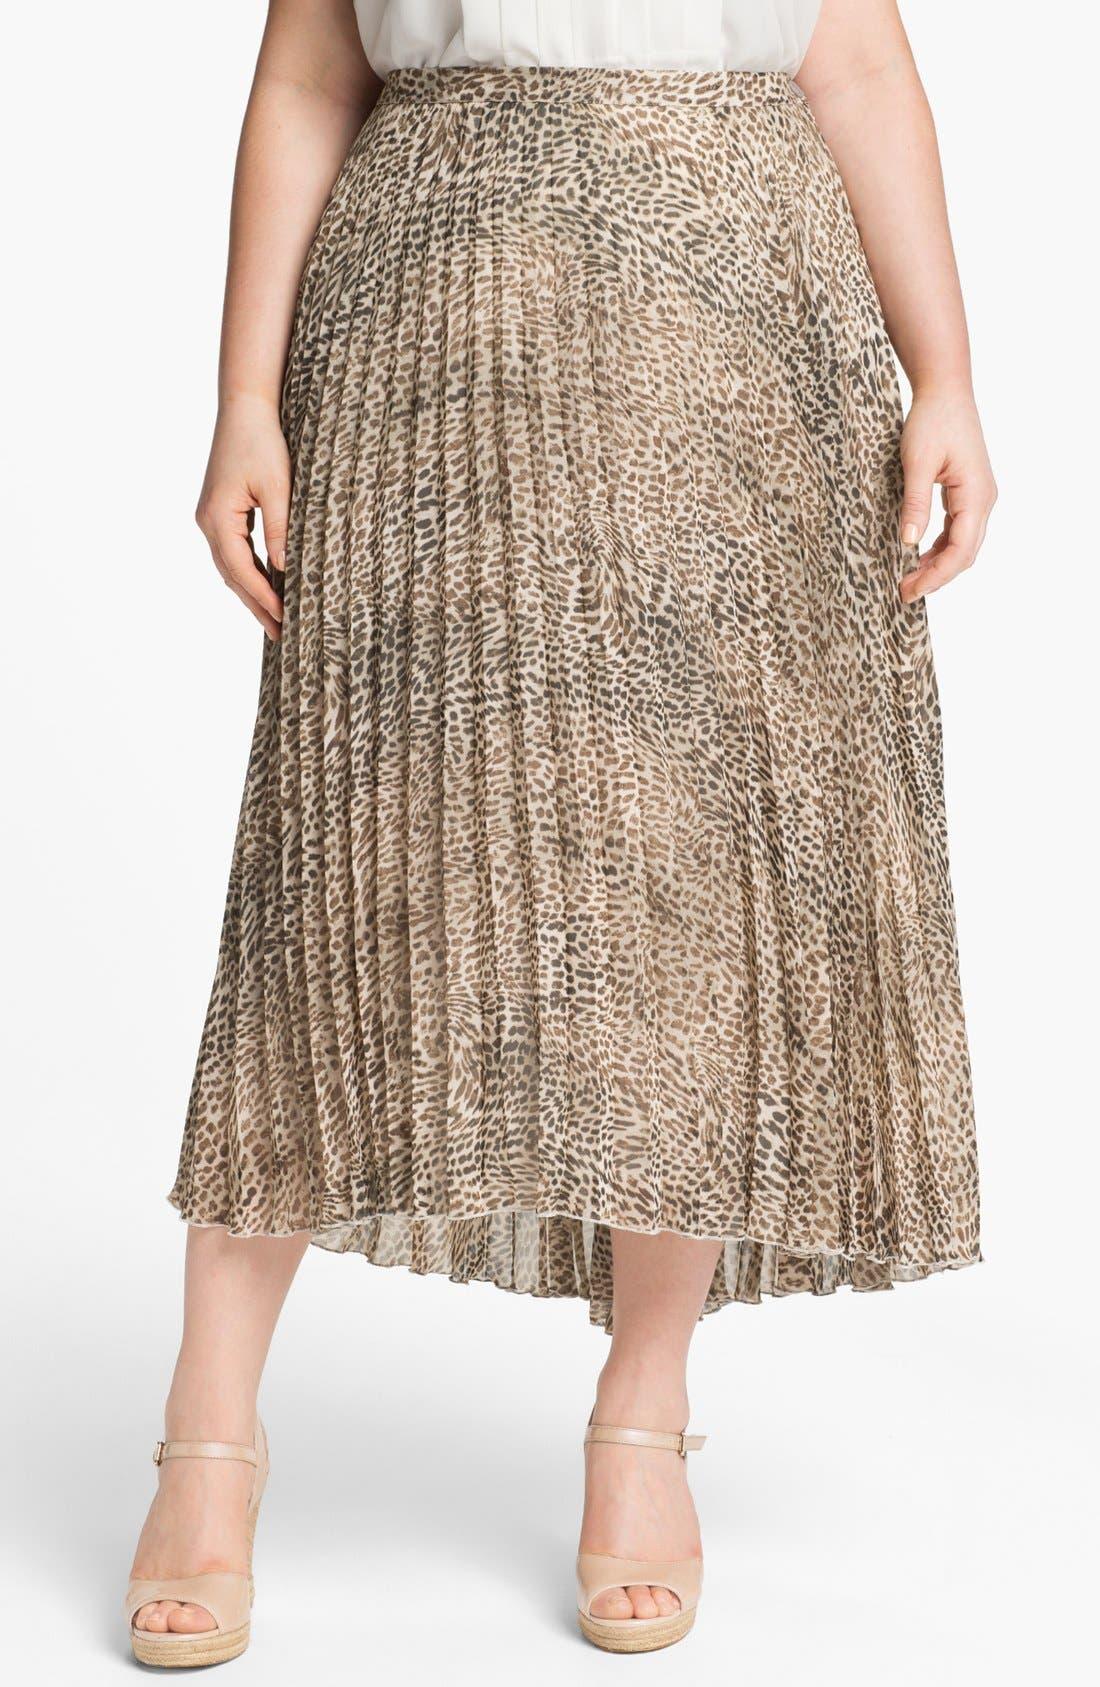 Main Image - Vince Camuto Cheetah Print Chiffon Skirt (Plus Size)